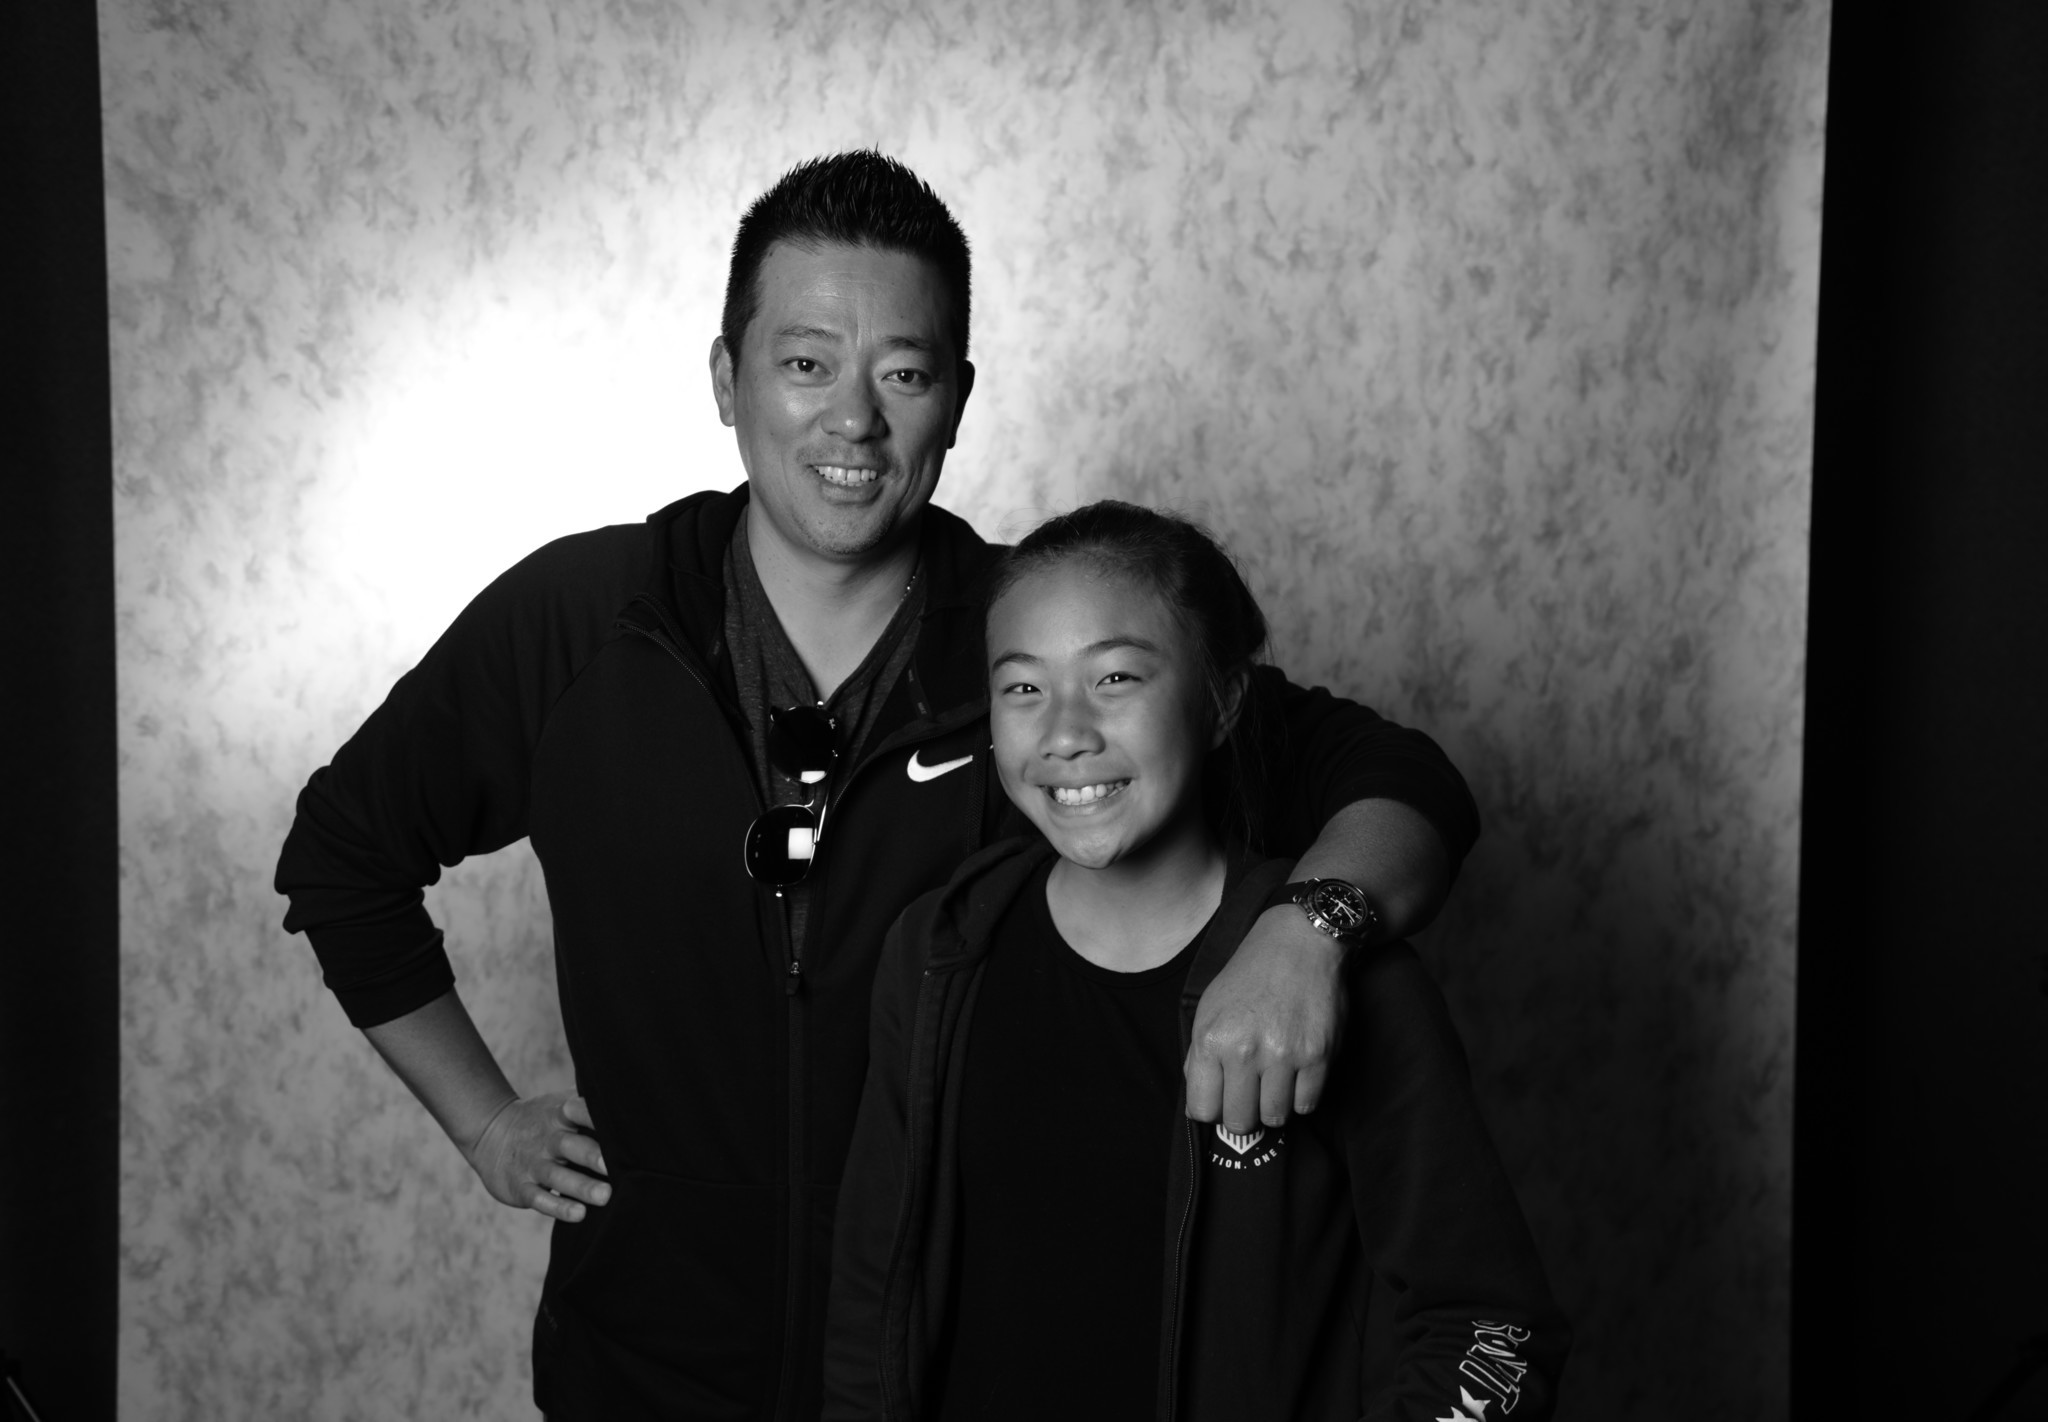 James Shin with his daughter, Fiona Shin, 12